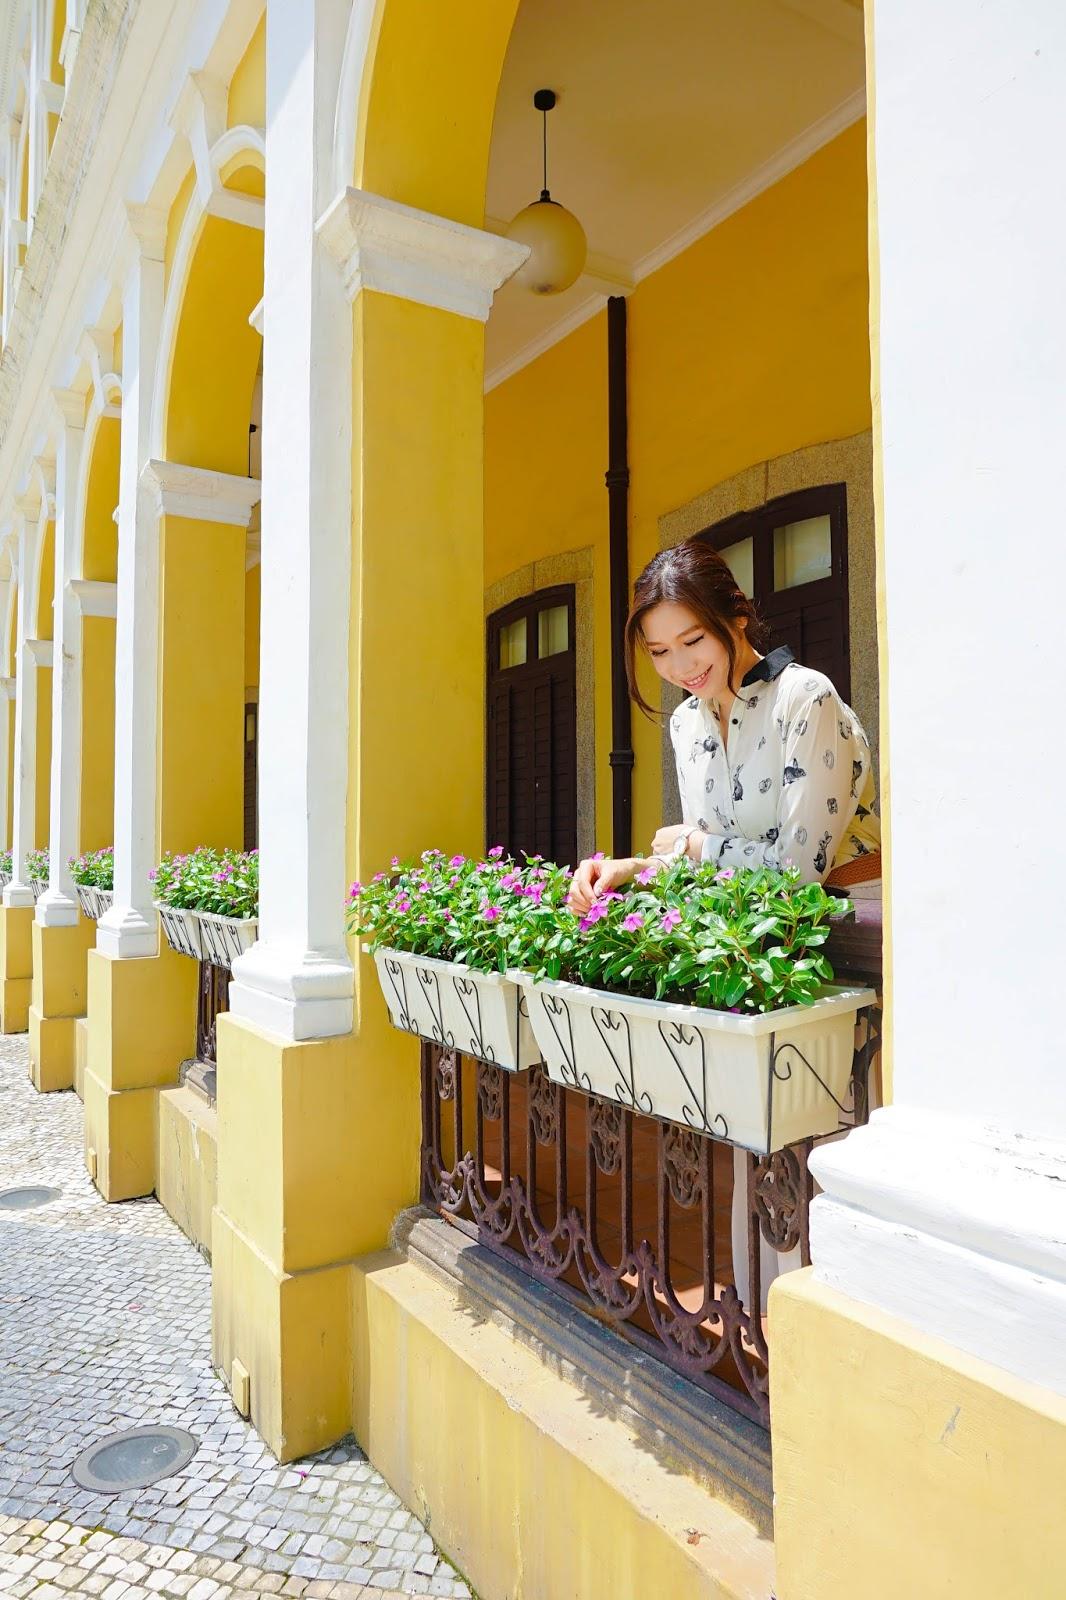 beautyanxiety.com-Macau Tap Seac Square-beautyanxiety.com-Macau%2BTap%2BSeac%2BSquare-DSC09515.jpg